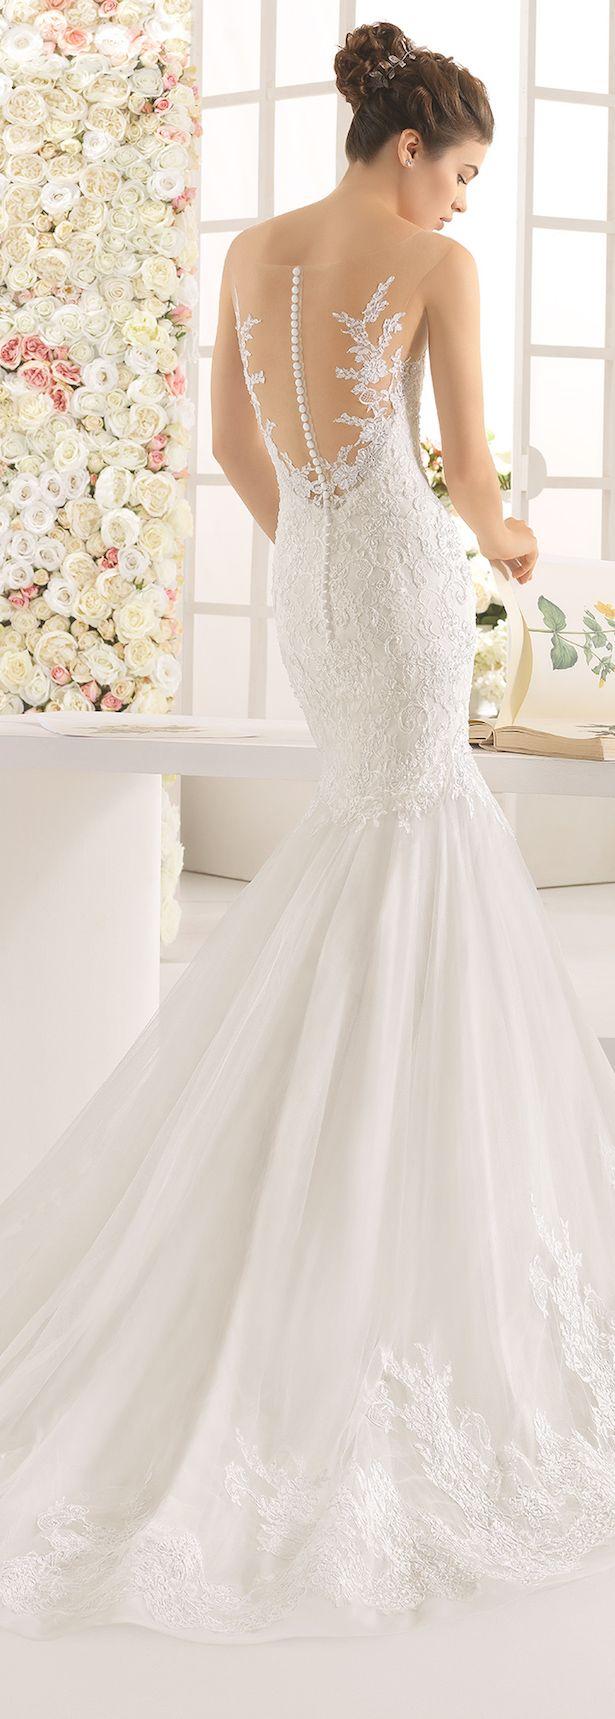 Wedding-Dresses-0547